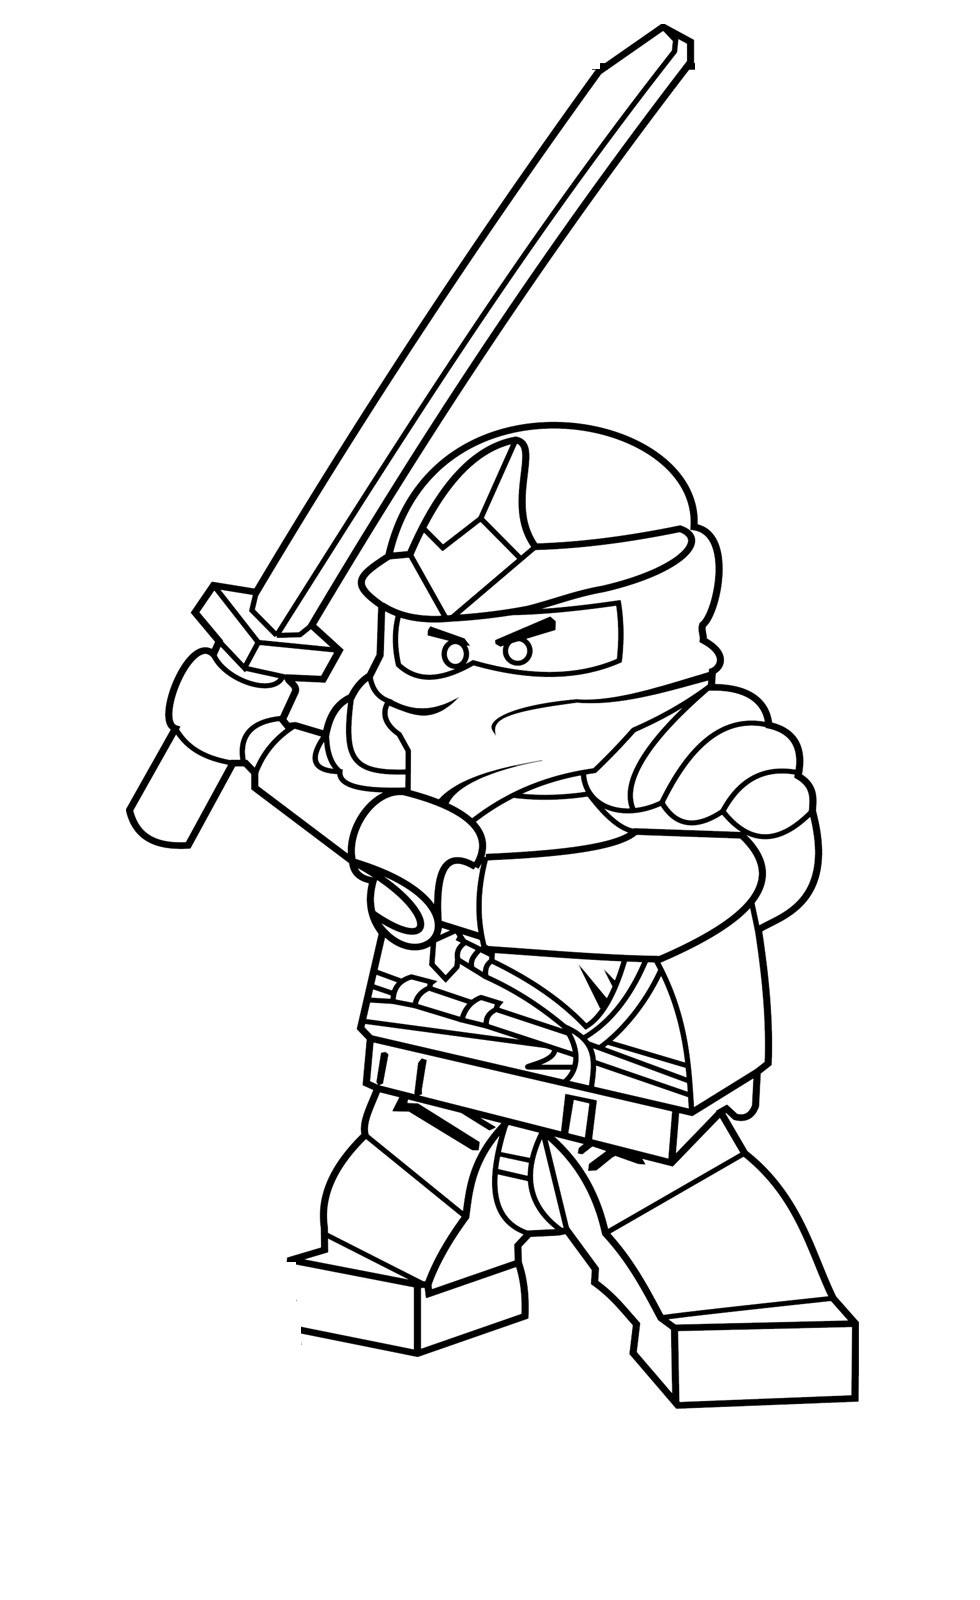 Coloriage Ninjago #5 (Dessins Animés) - Coloriages à imprimer